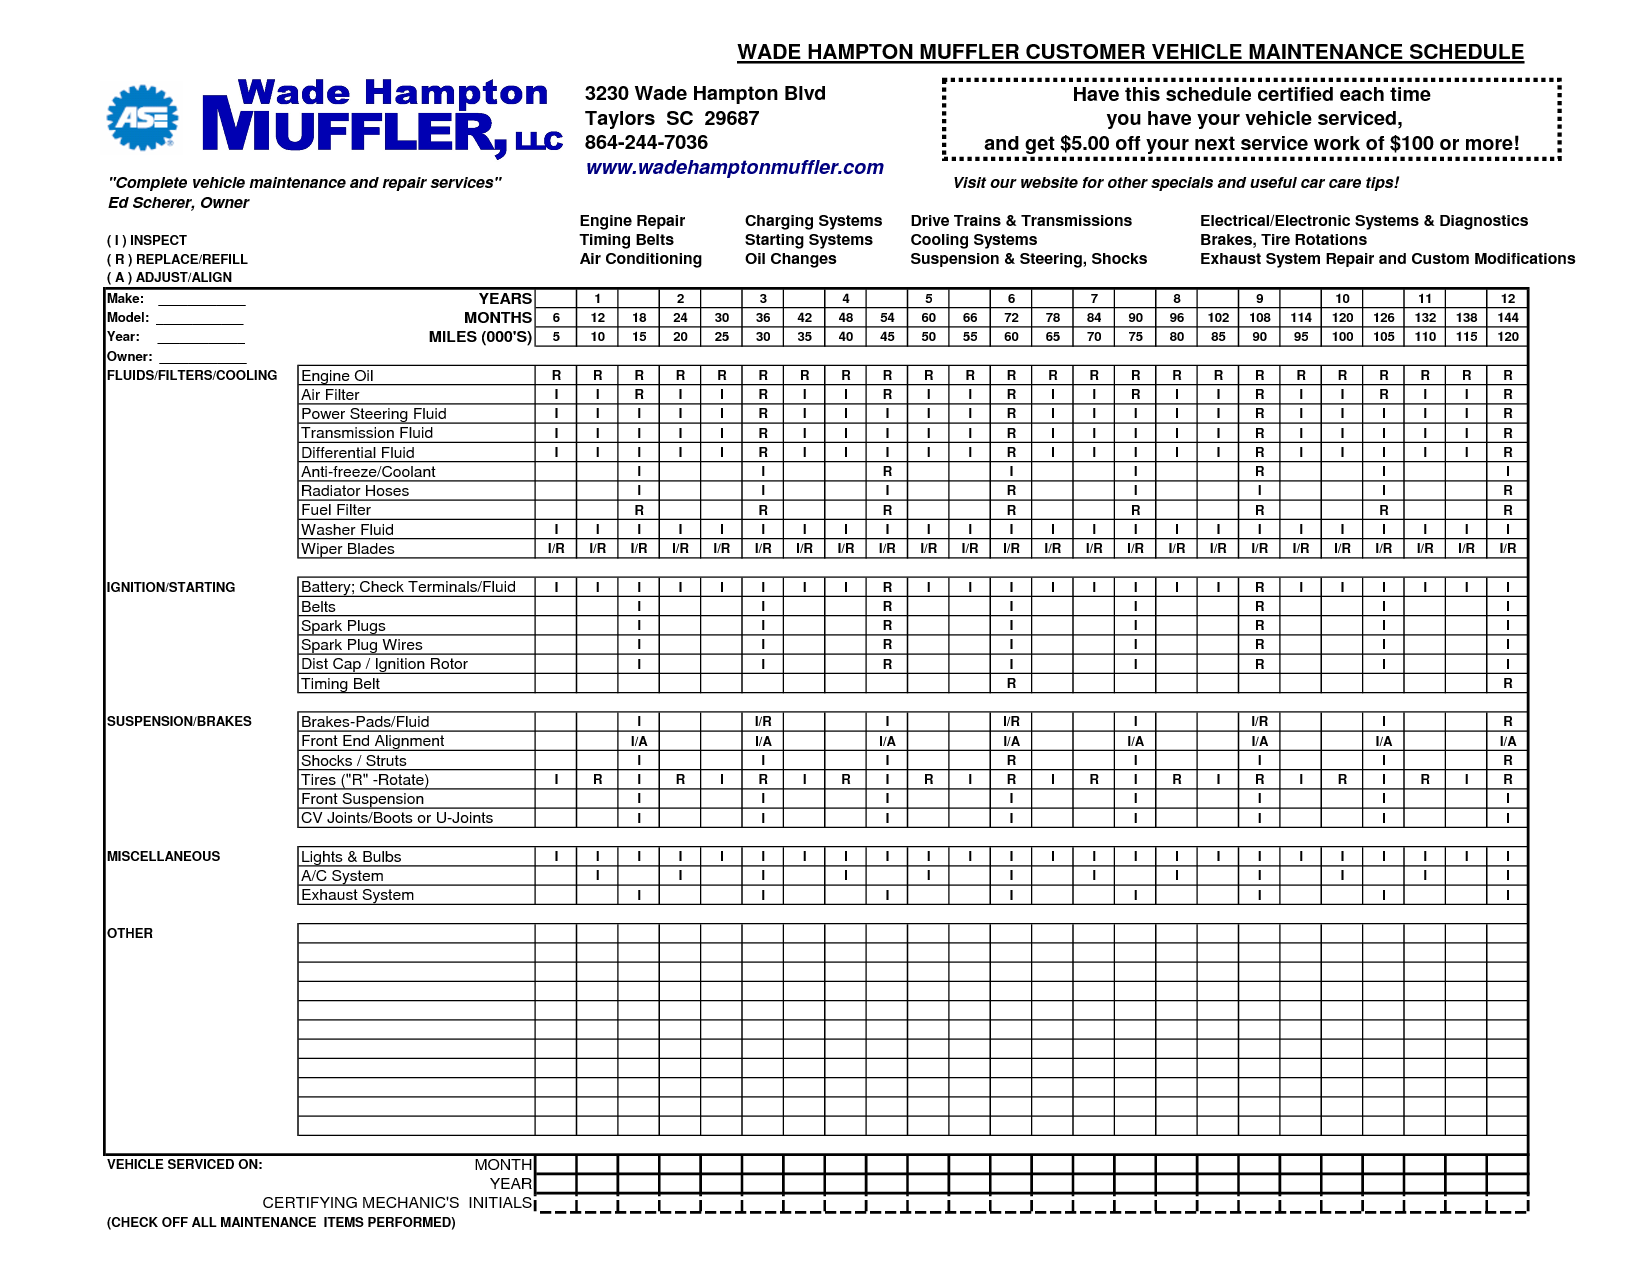 vehicle maintenance schedule chart car maintenance tips vehicle